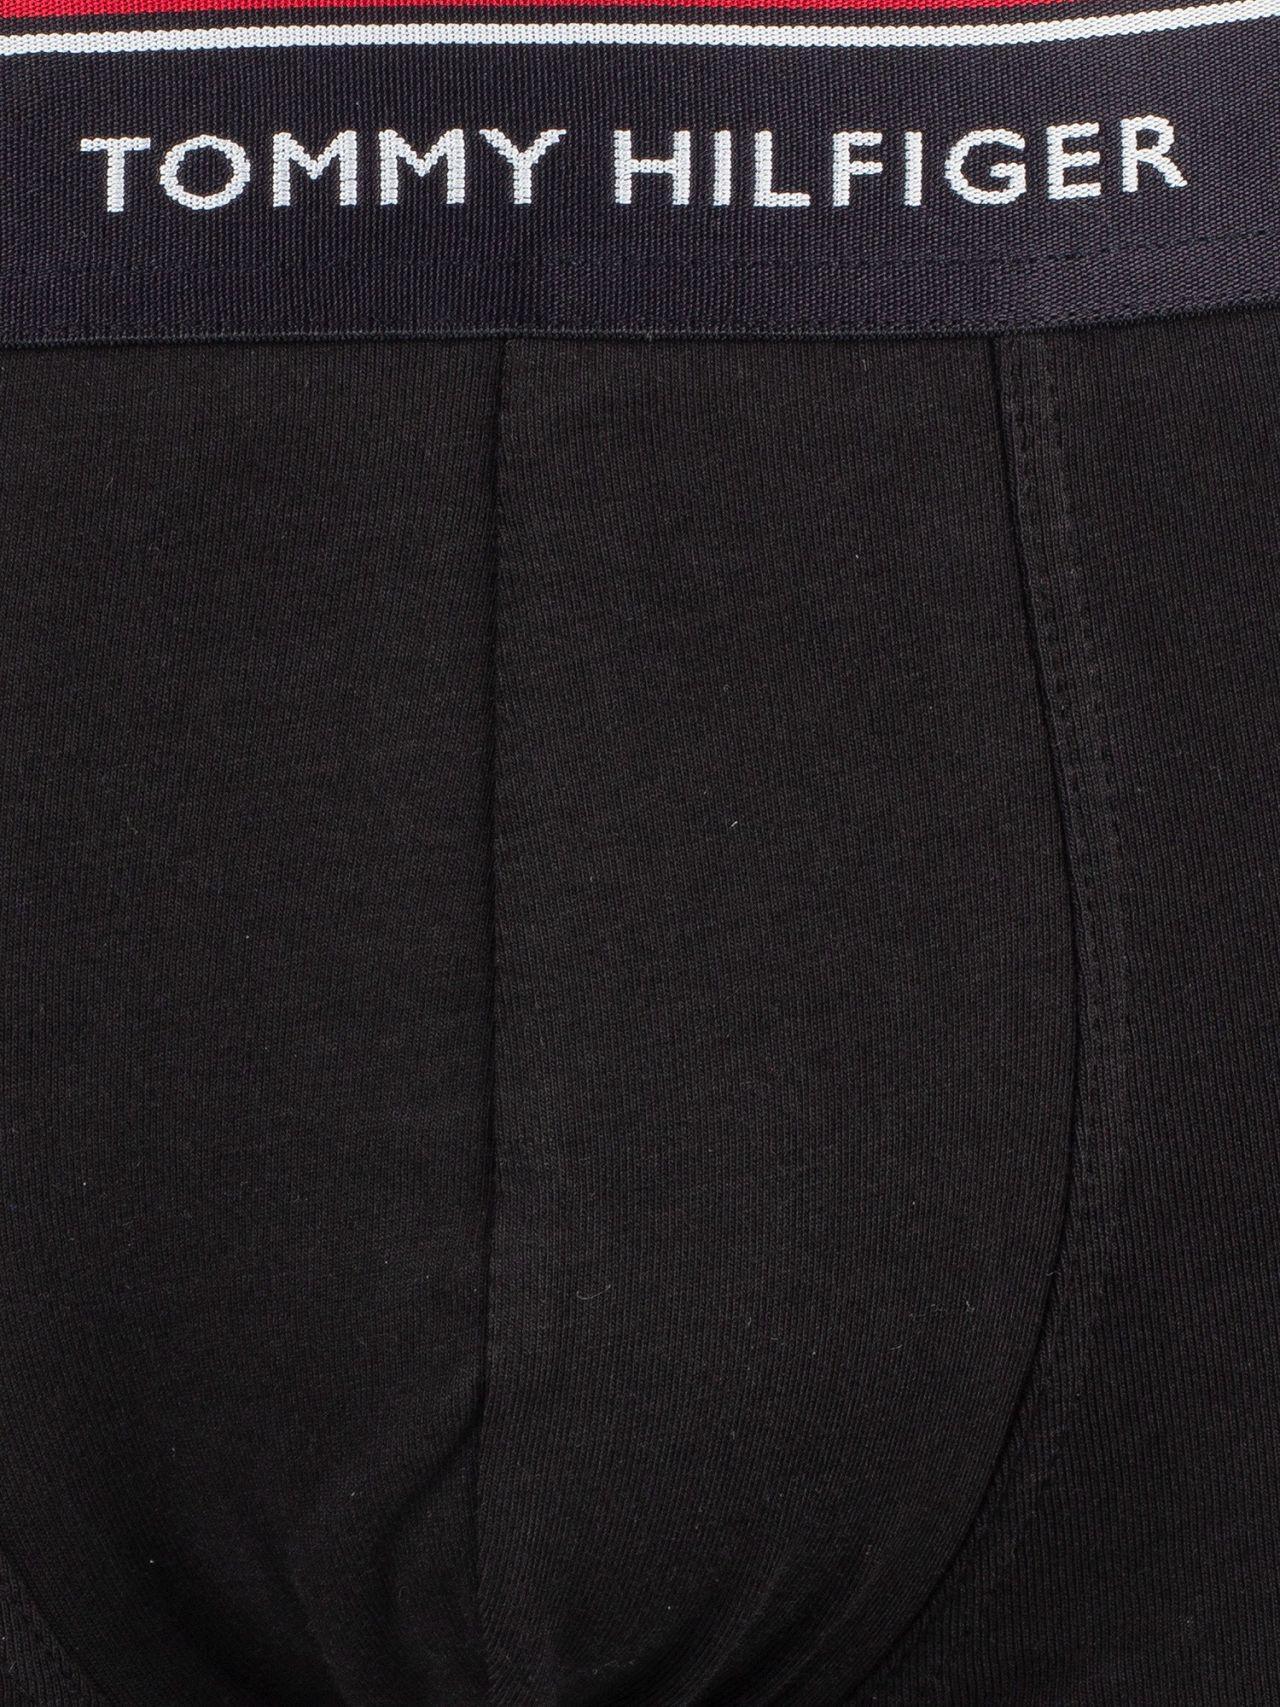 1c52490e5c5b Lyst - Tommy Hilfiger Pomegranate/peacoat/black 3 Pack Premium Essentials  Trunks in Black for Men